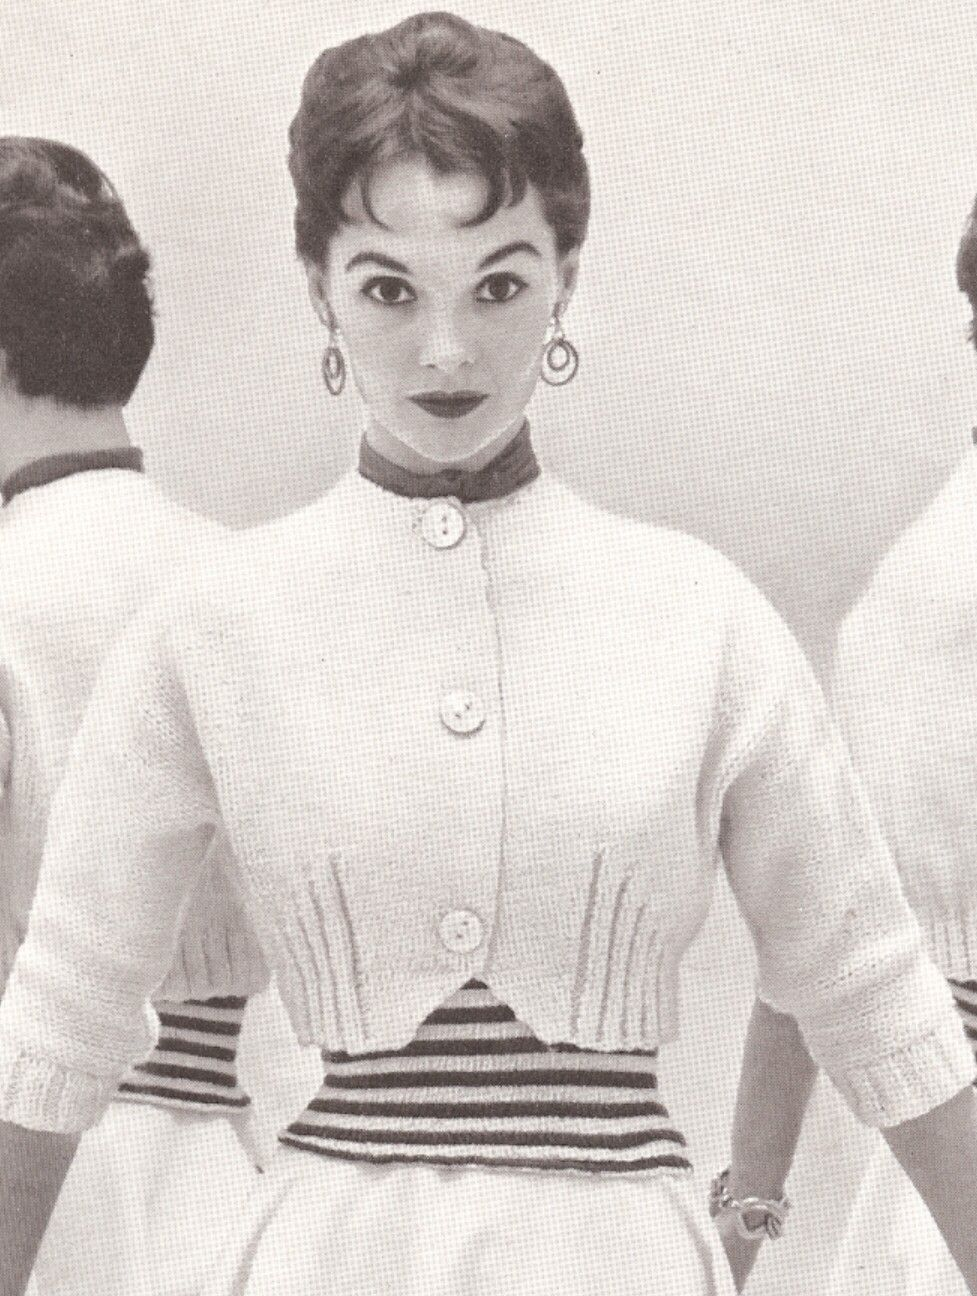 Vintage Knitting PATTERN to make Lacy Bolero Shrug Jacket 1950s GatheredBolero